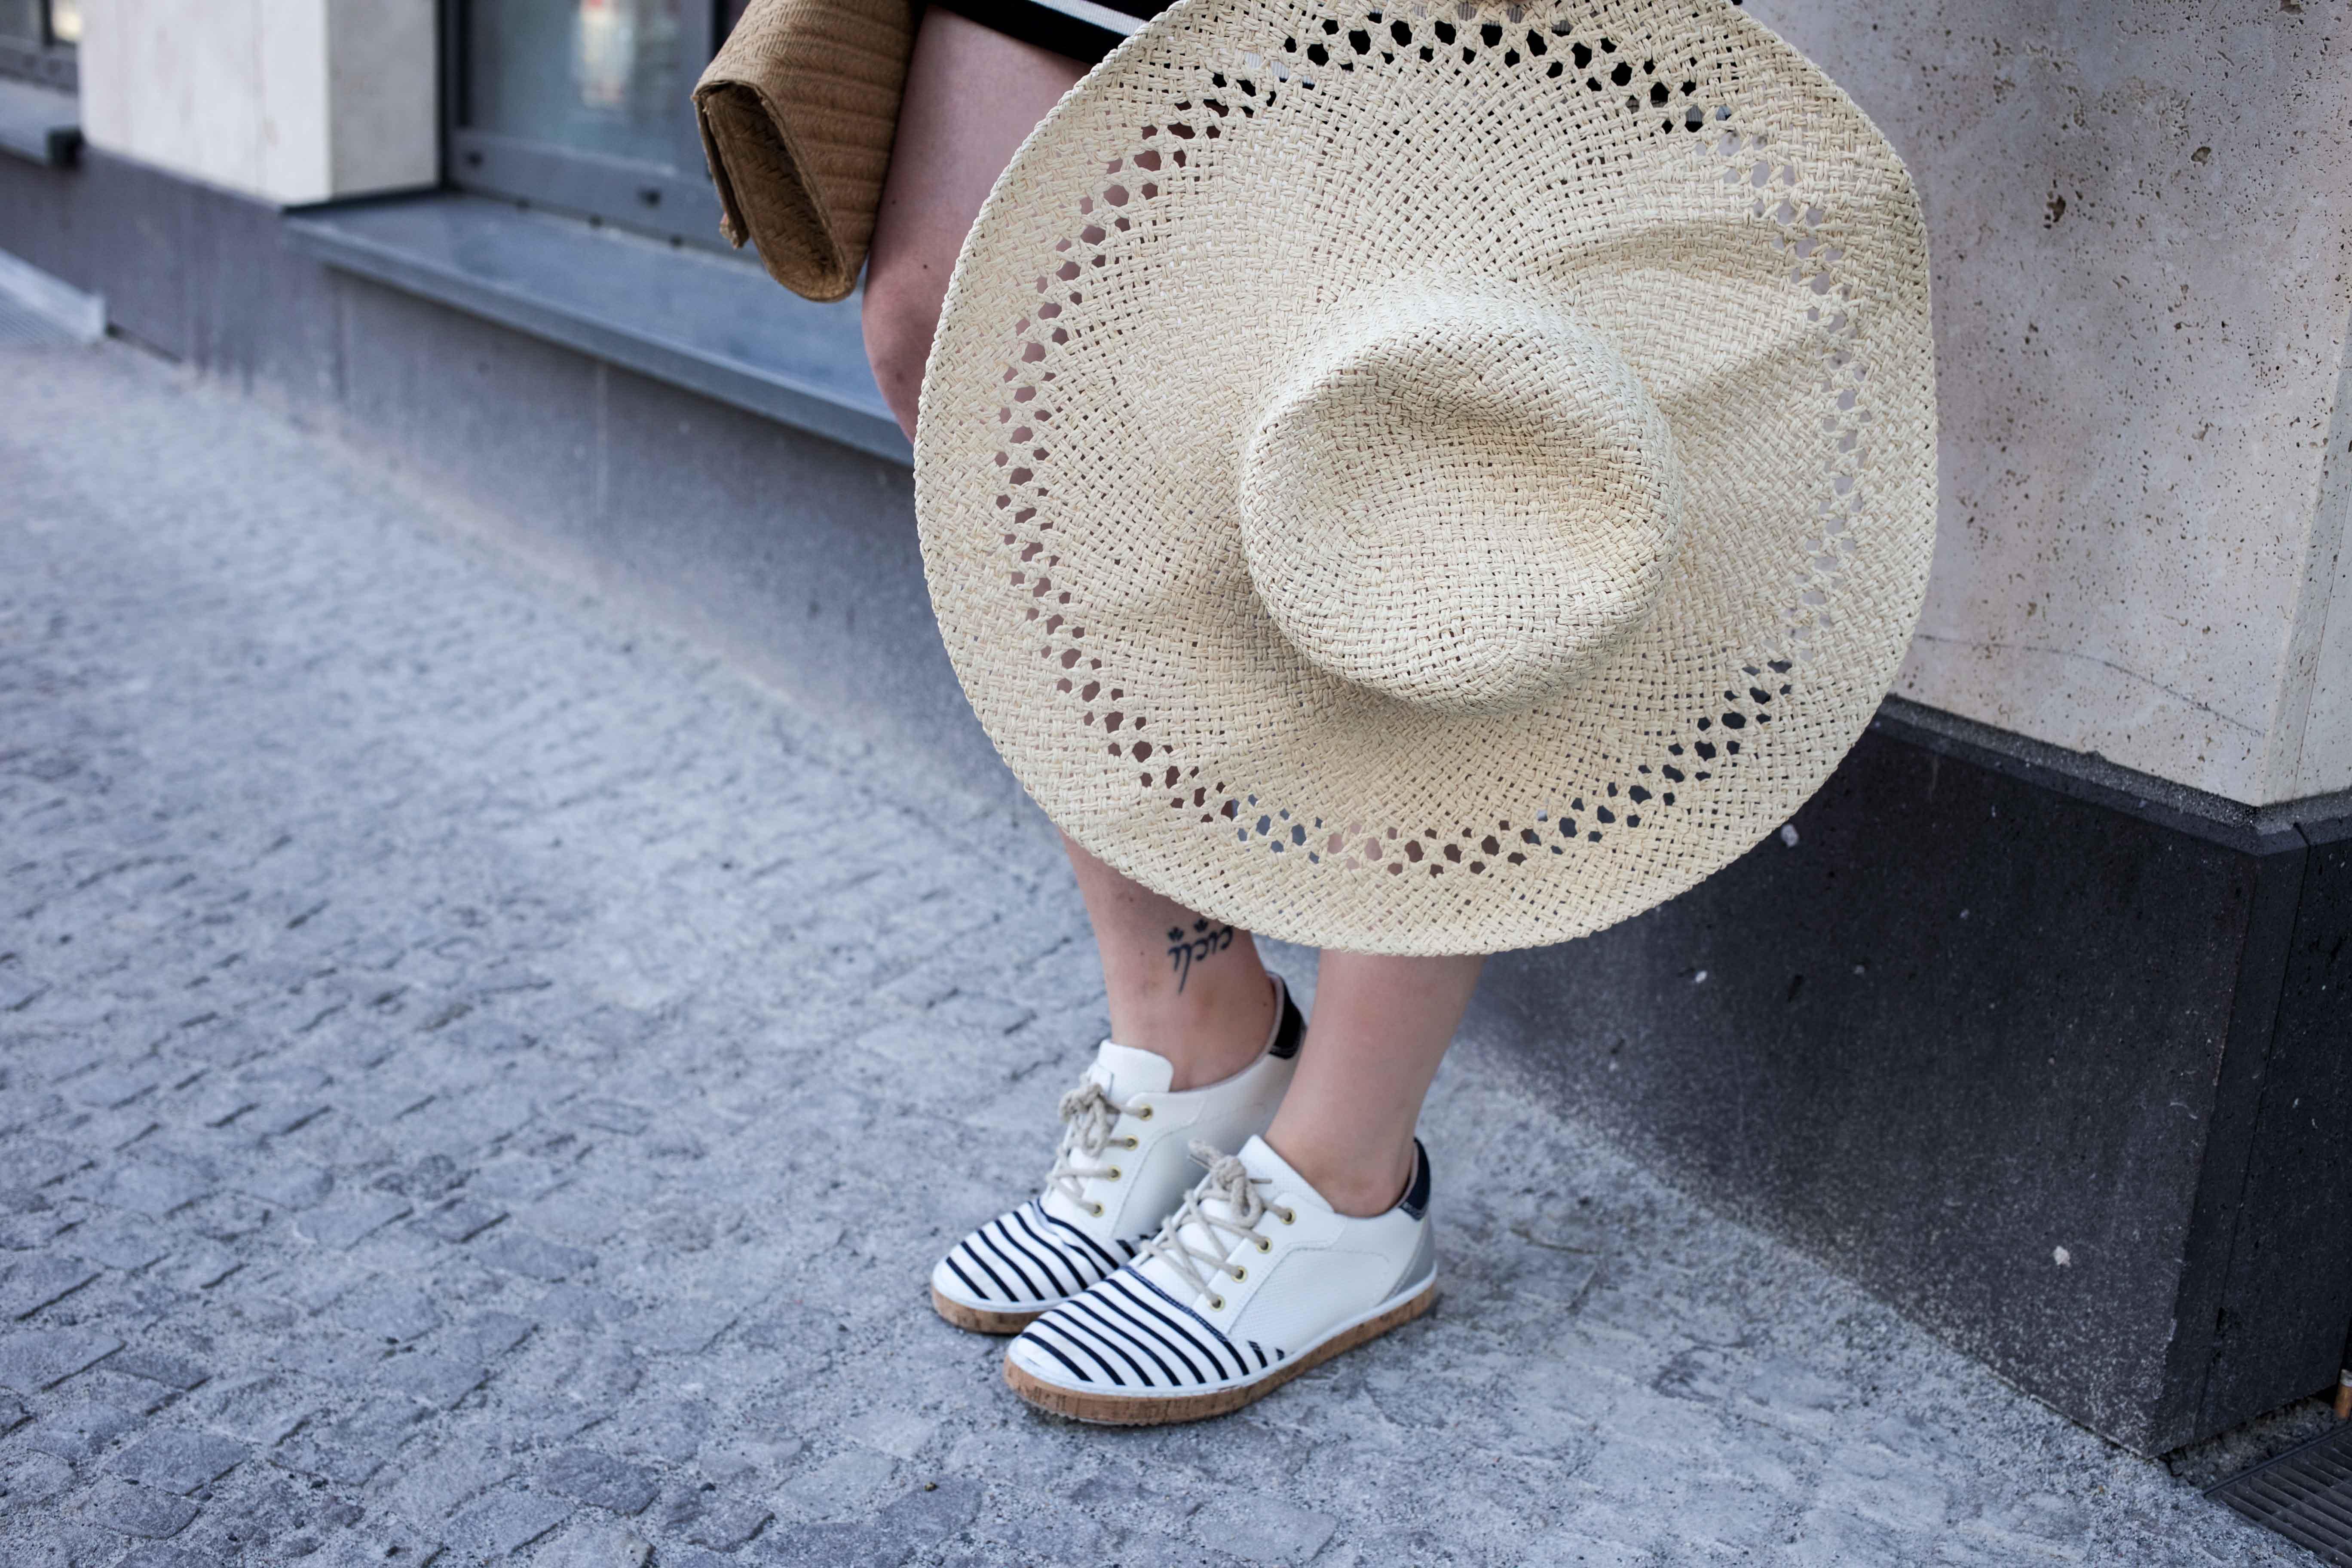 modeblog-fashionblog-berlin-köln-cologne-sonnenhut-outfit-fashion-lifestyle-sommerloo-10